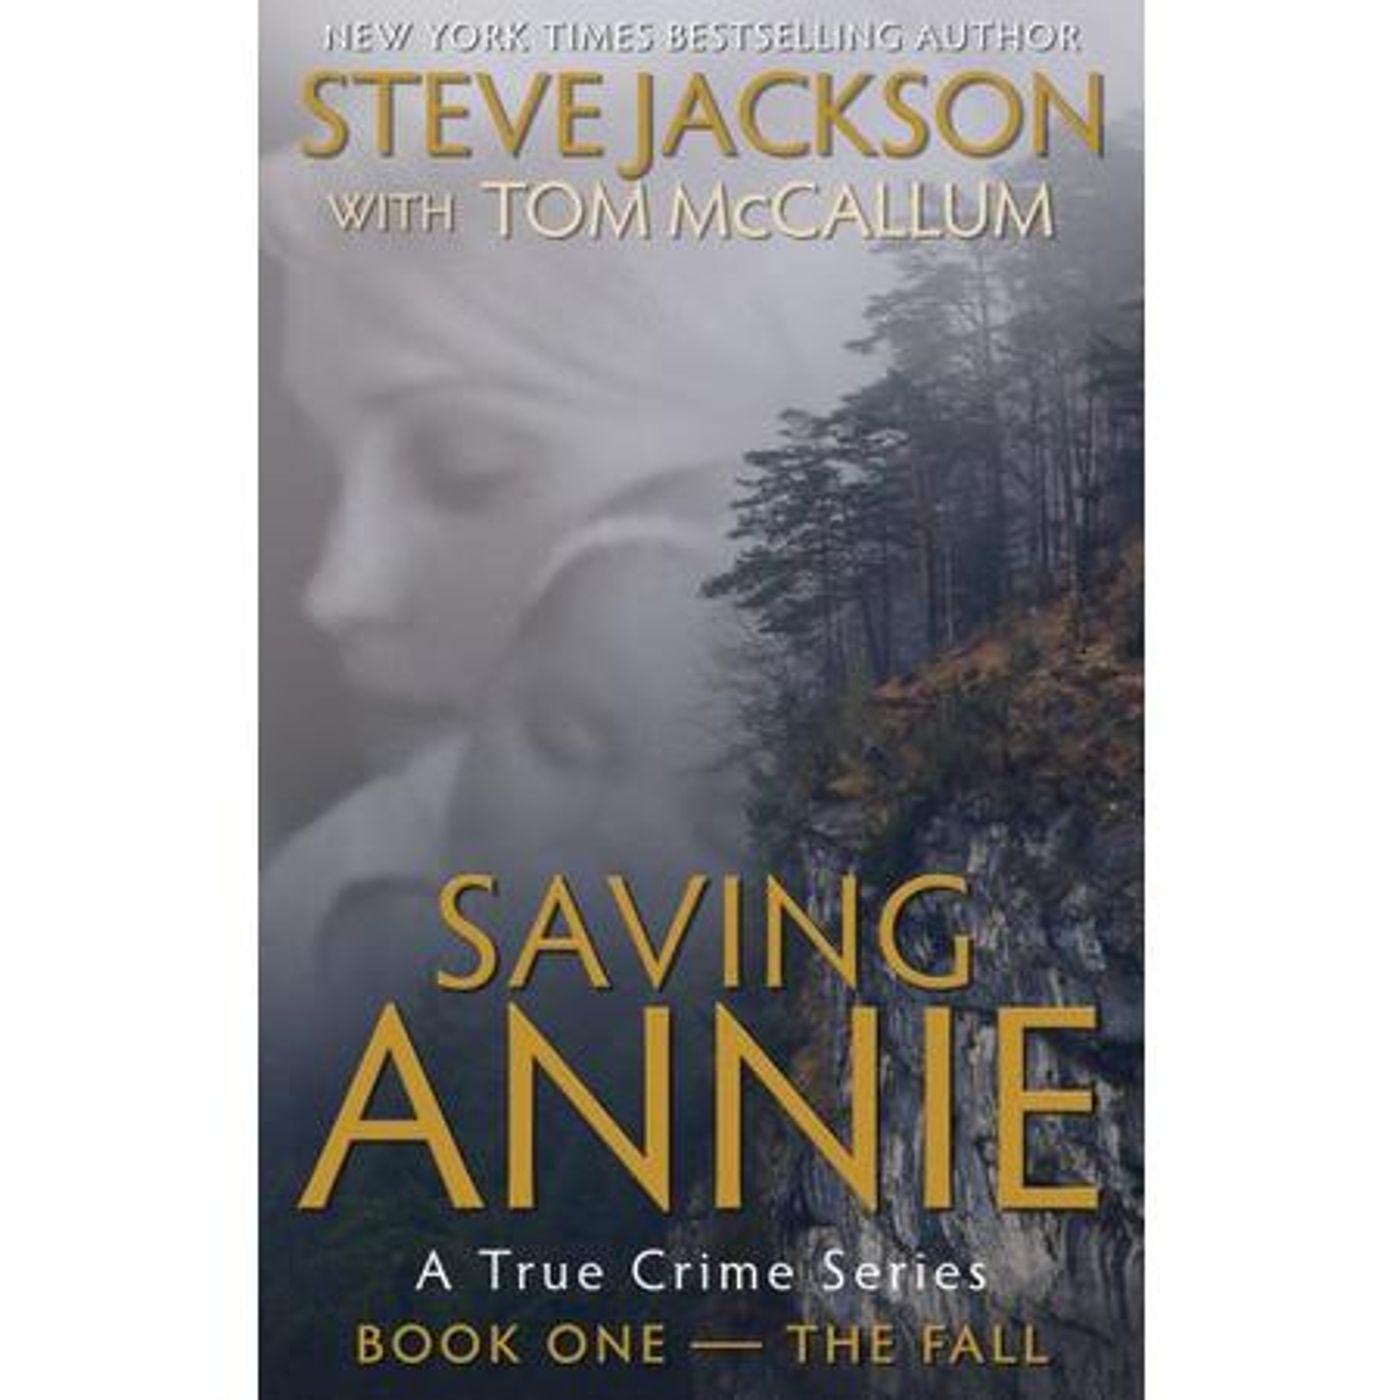 SAVING ANNIE-Book Two-The Investigator-Steve Jackson